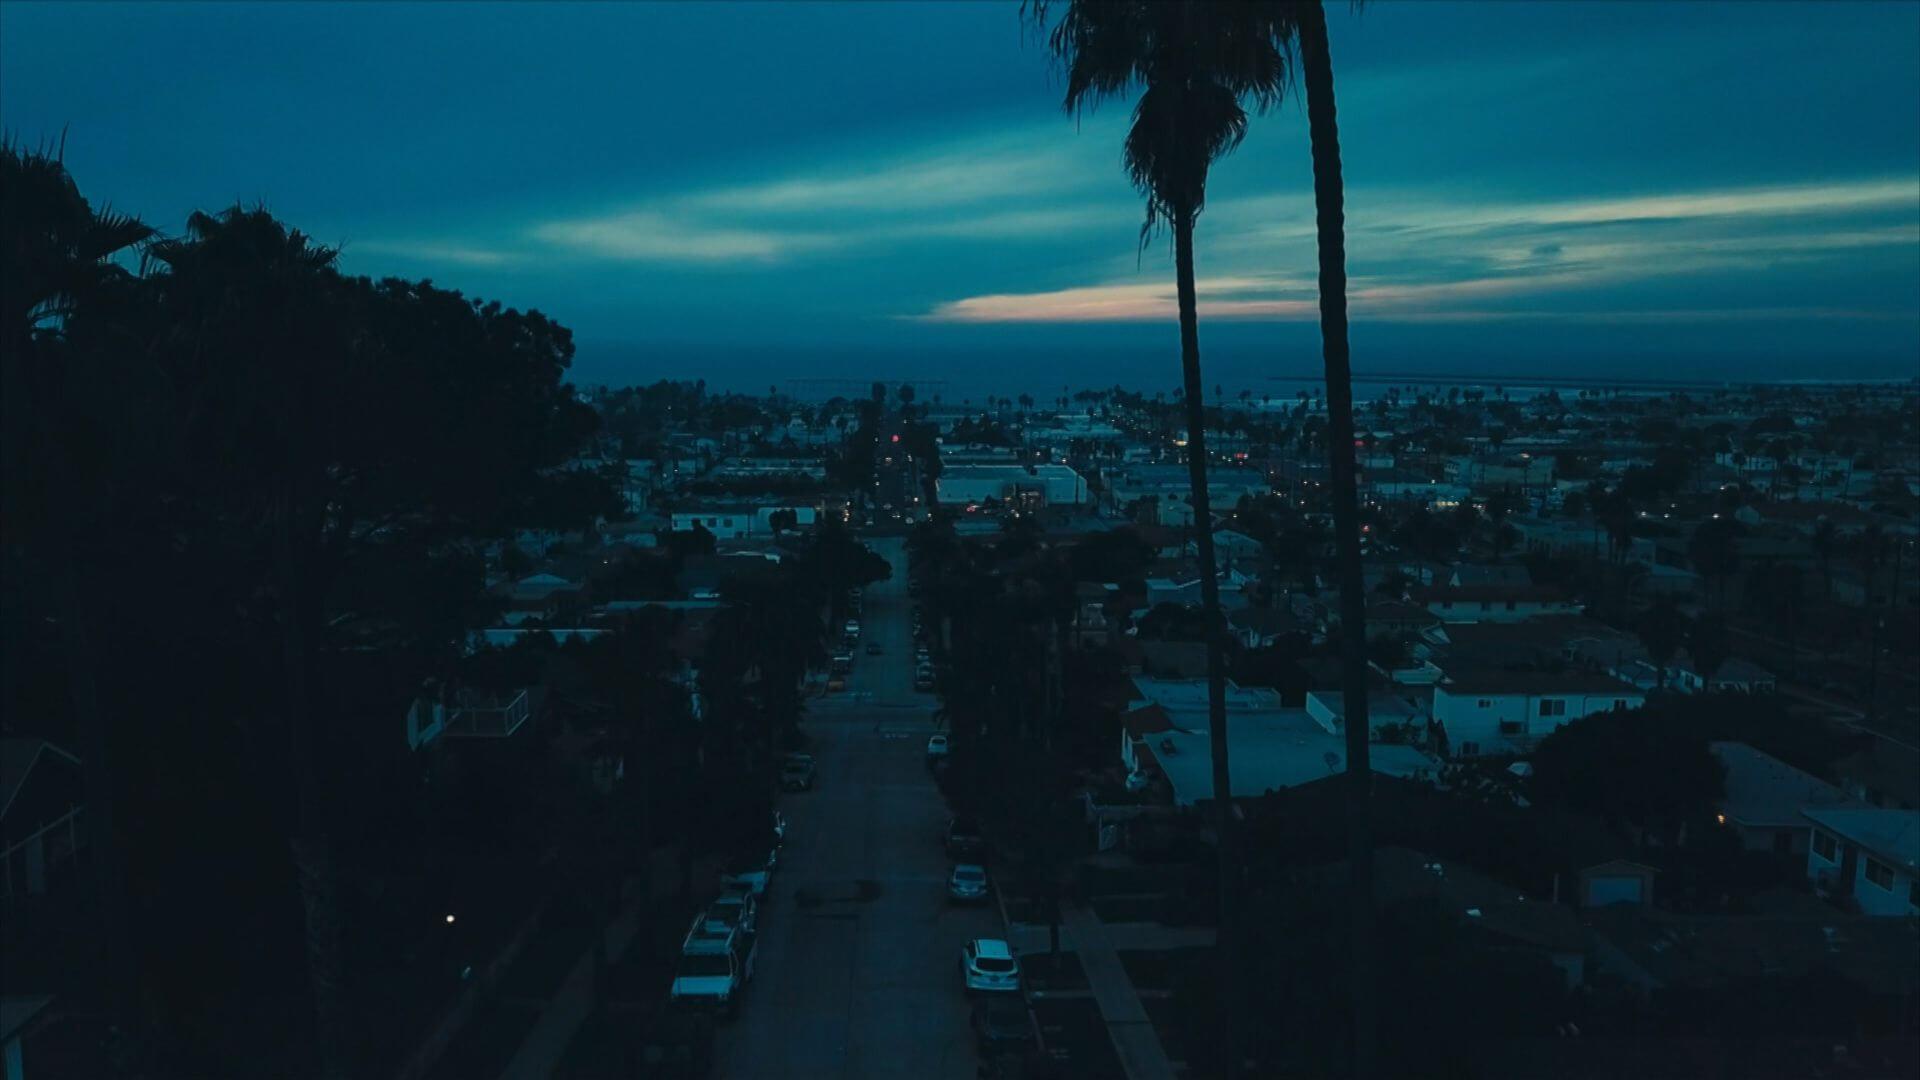 believers night skyline